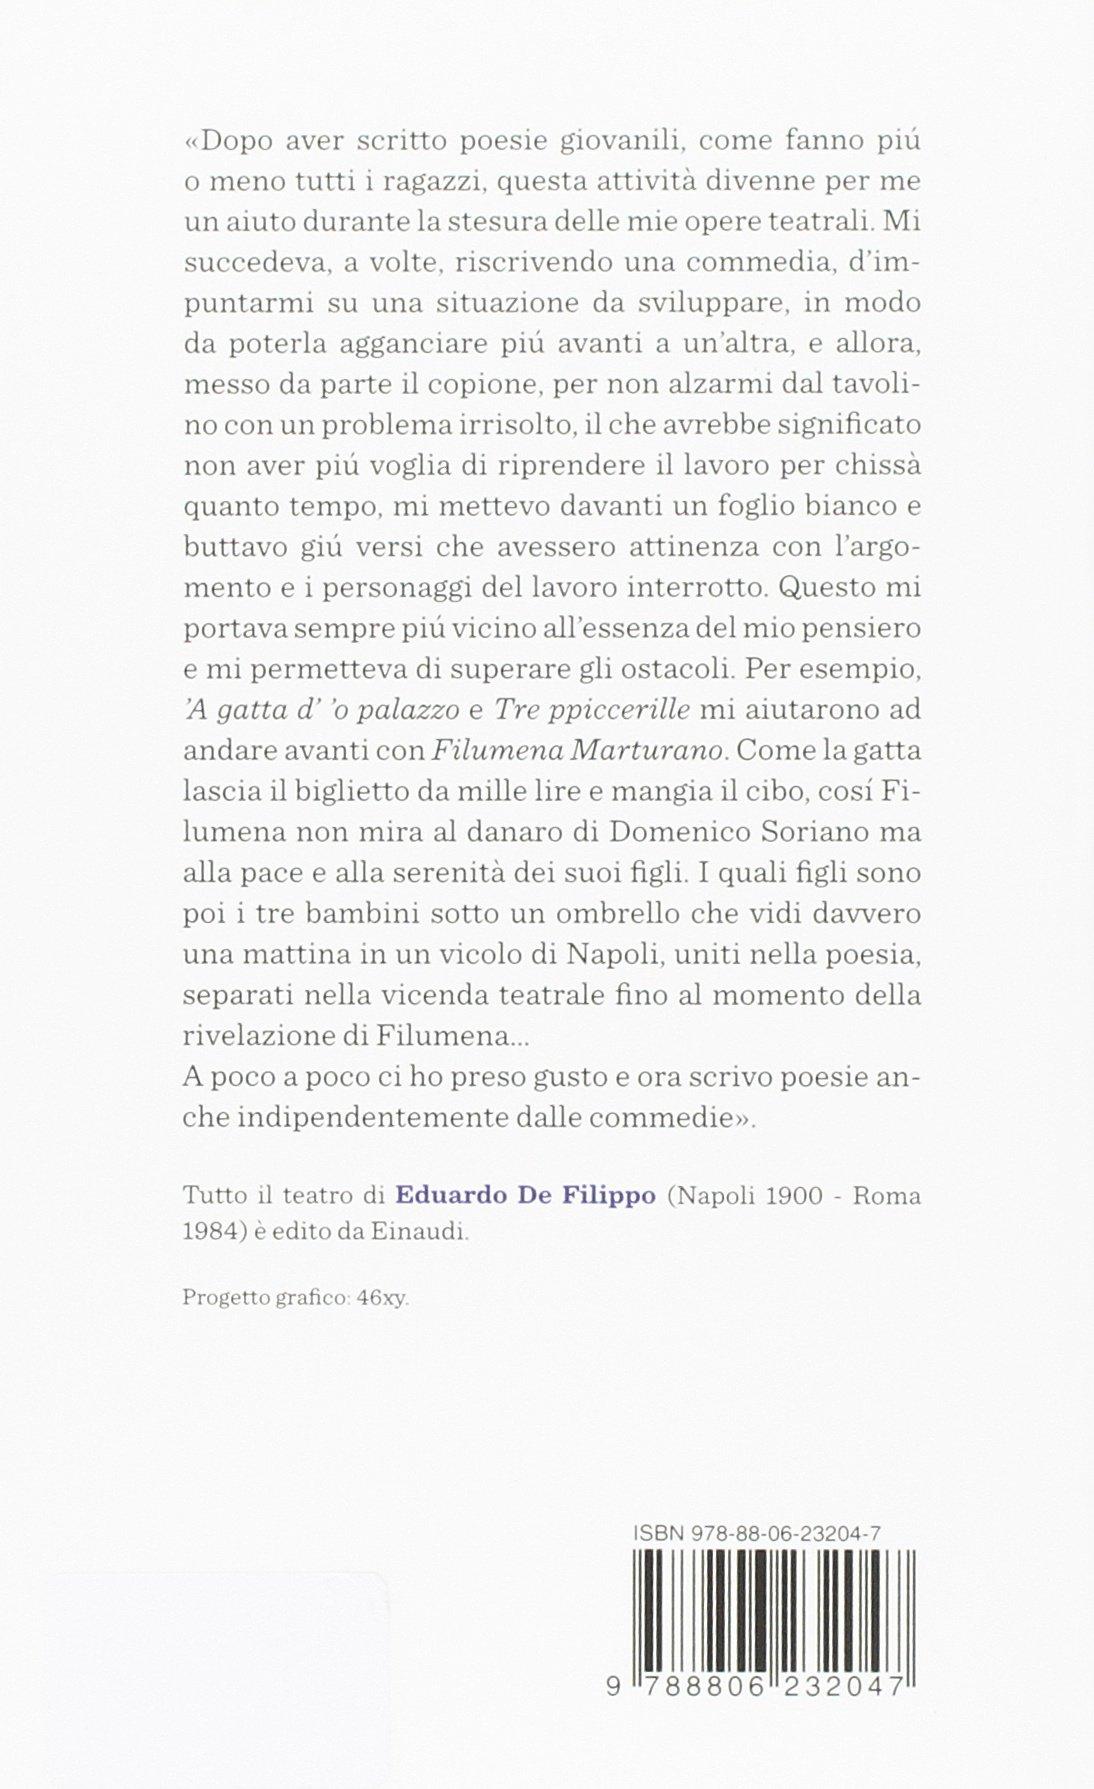 Le Poesie Amazon Co Uk De Filippo Eduardo 9788806232047 Books